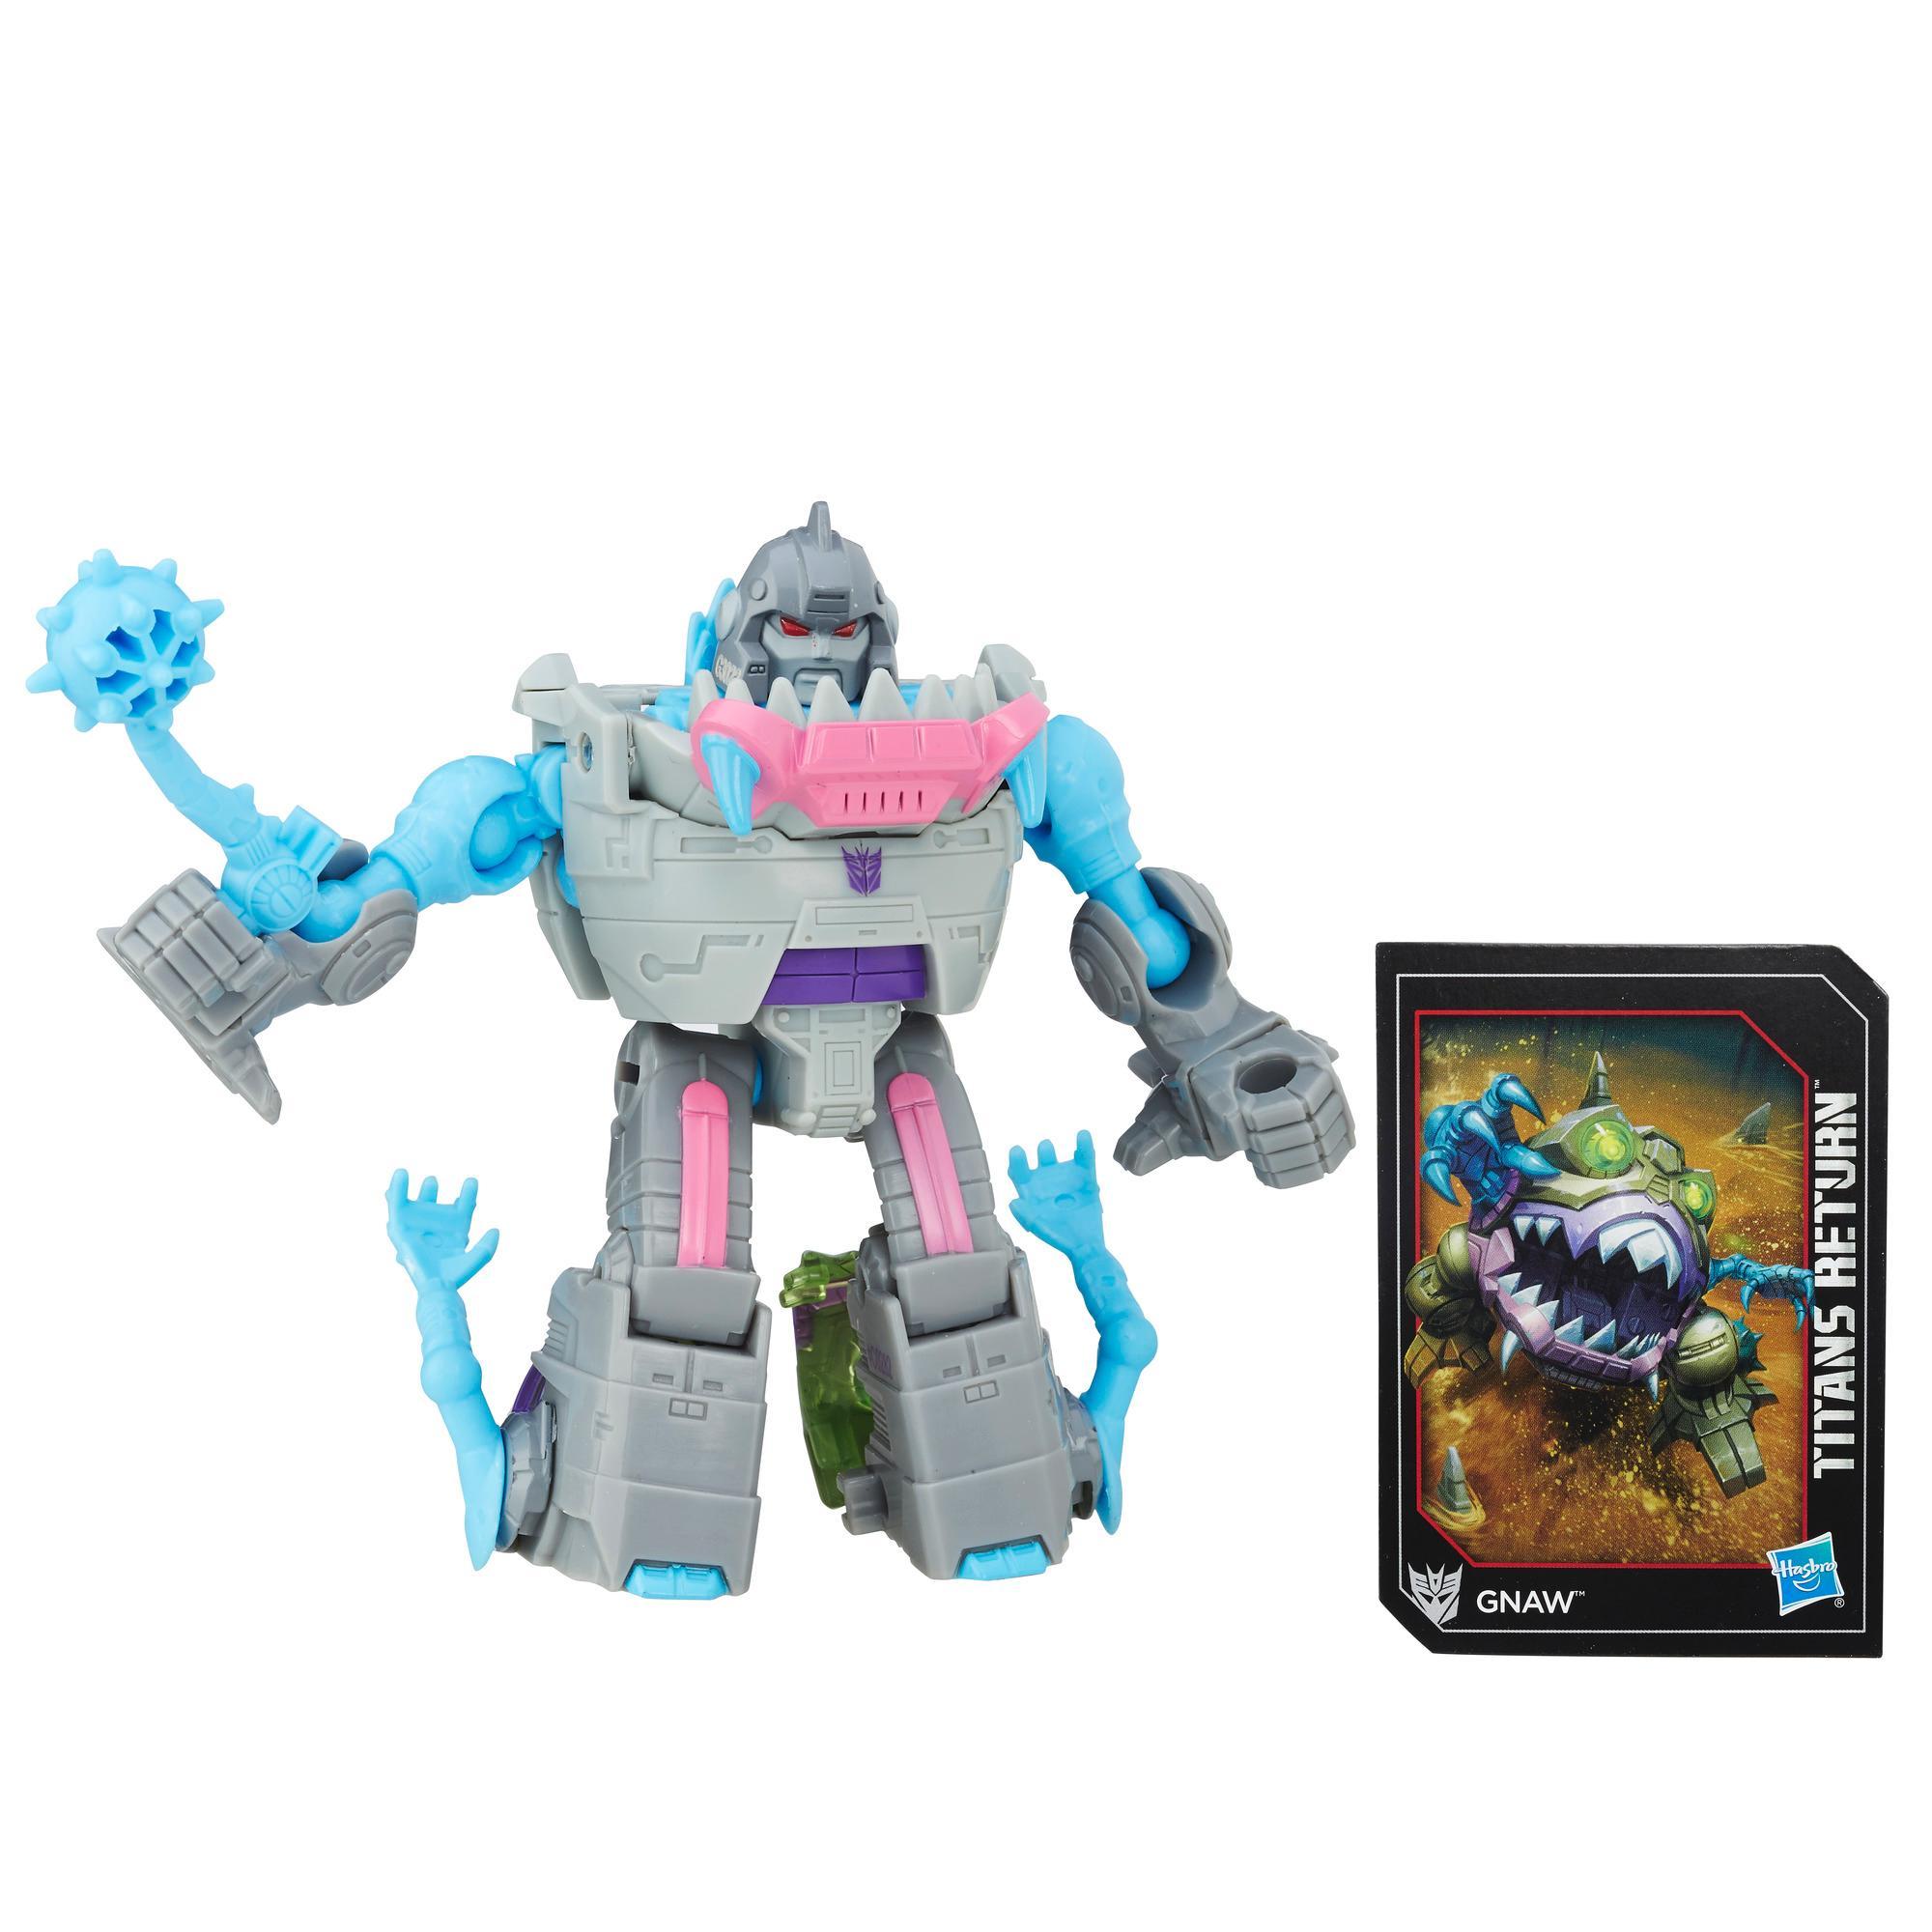 Transformers Generations Legends Titan Returns GNAW